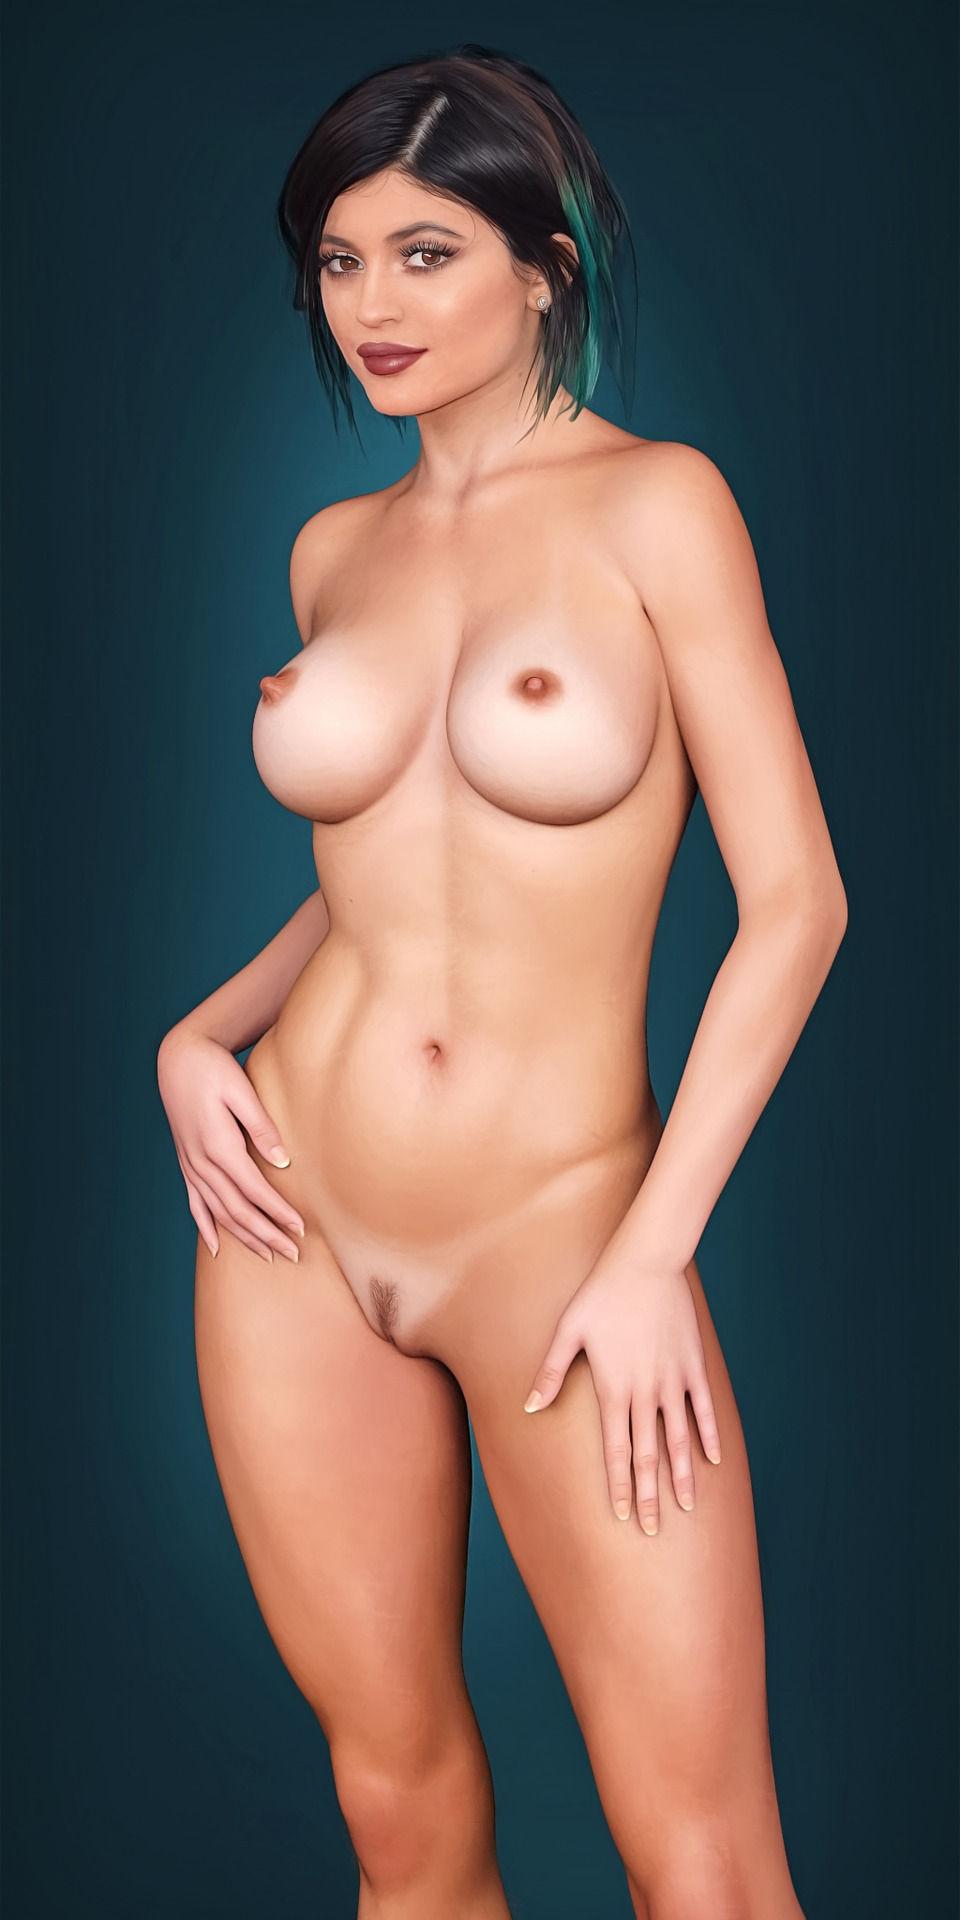 Blonde sexy photo